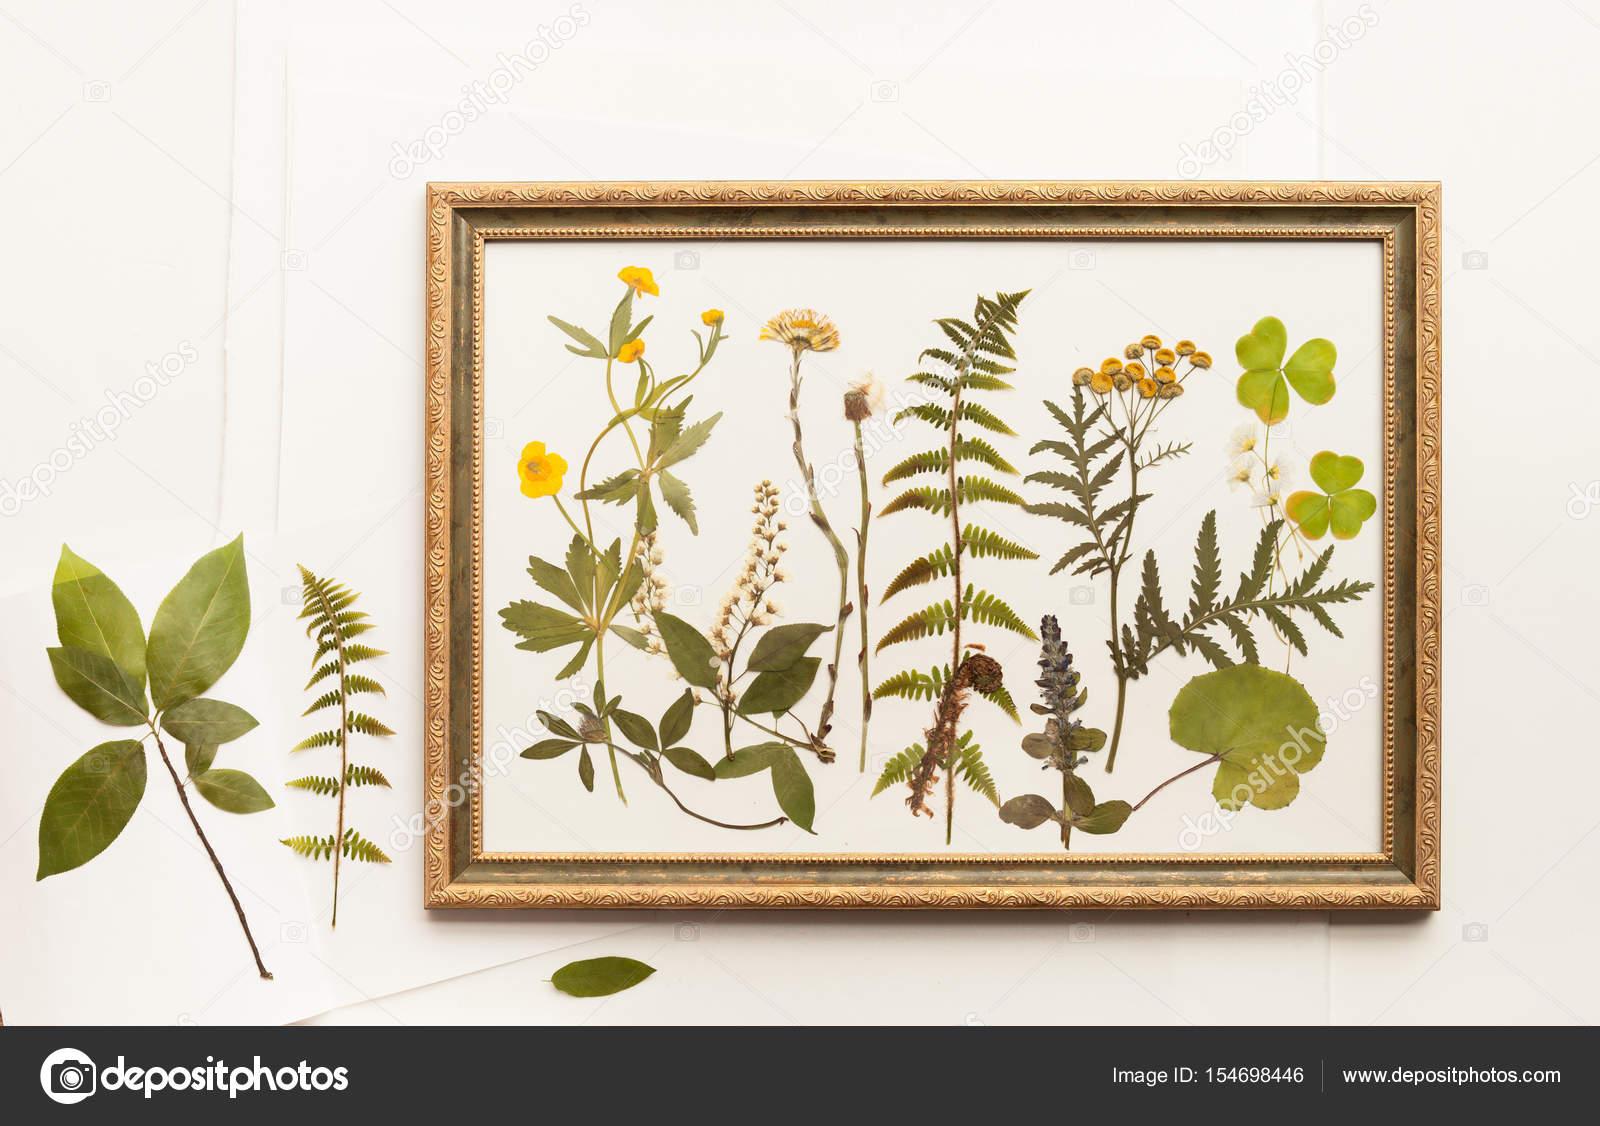 getrocknete pflanzen f r herbarium im rahmen stockfoto. Black Bedroom Furniture Sets. Home Design Ideas